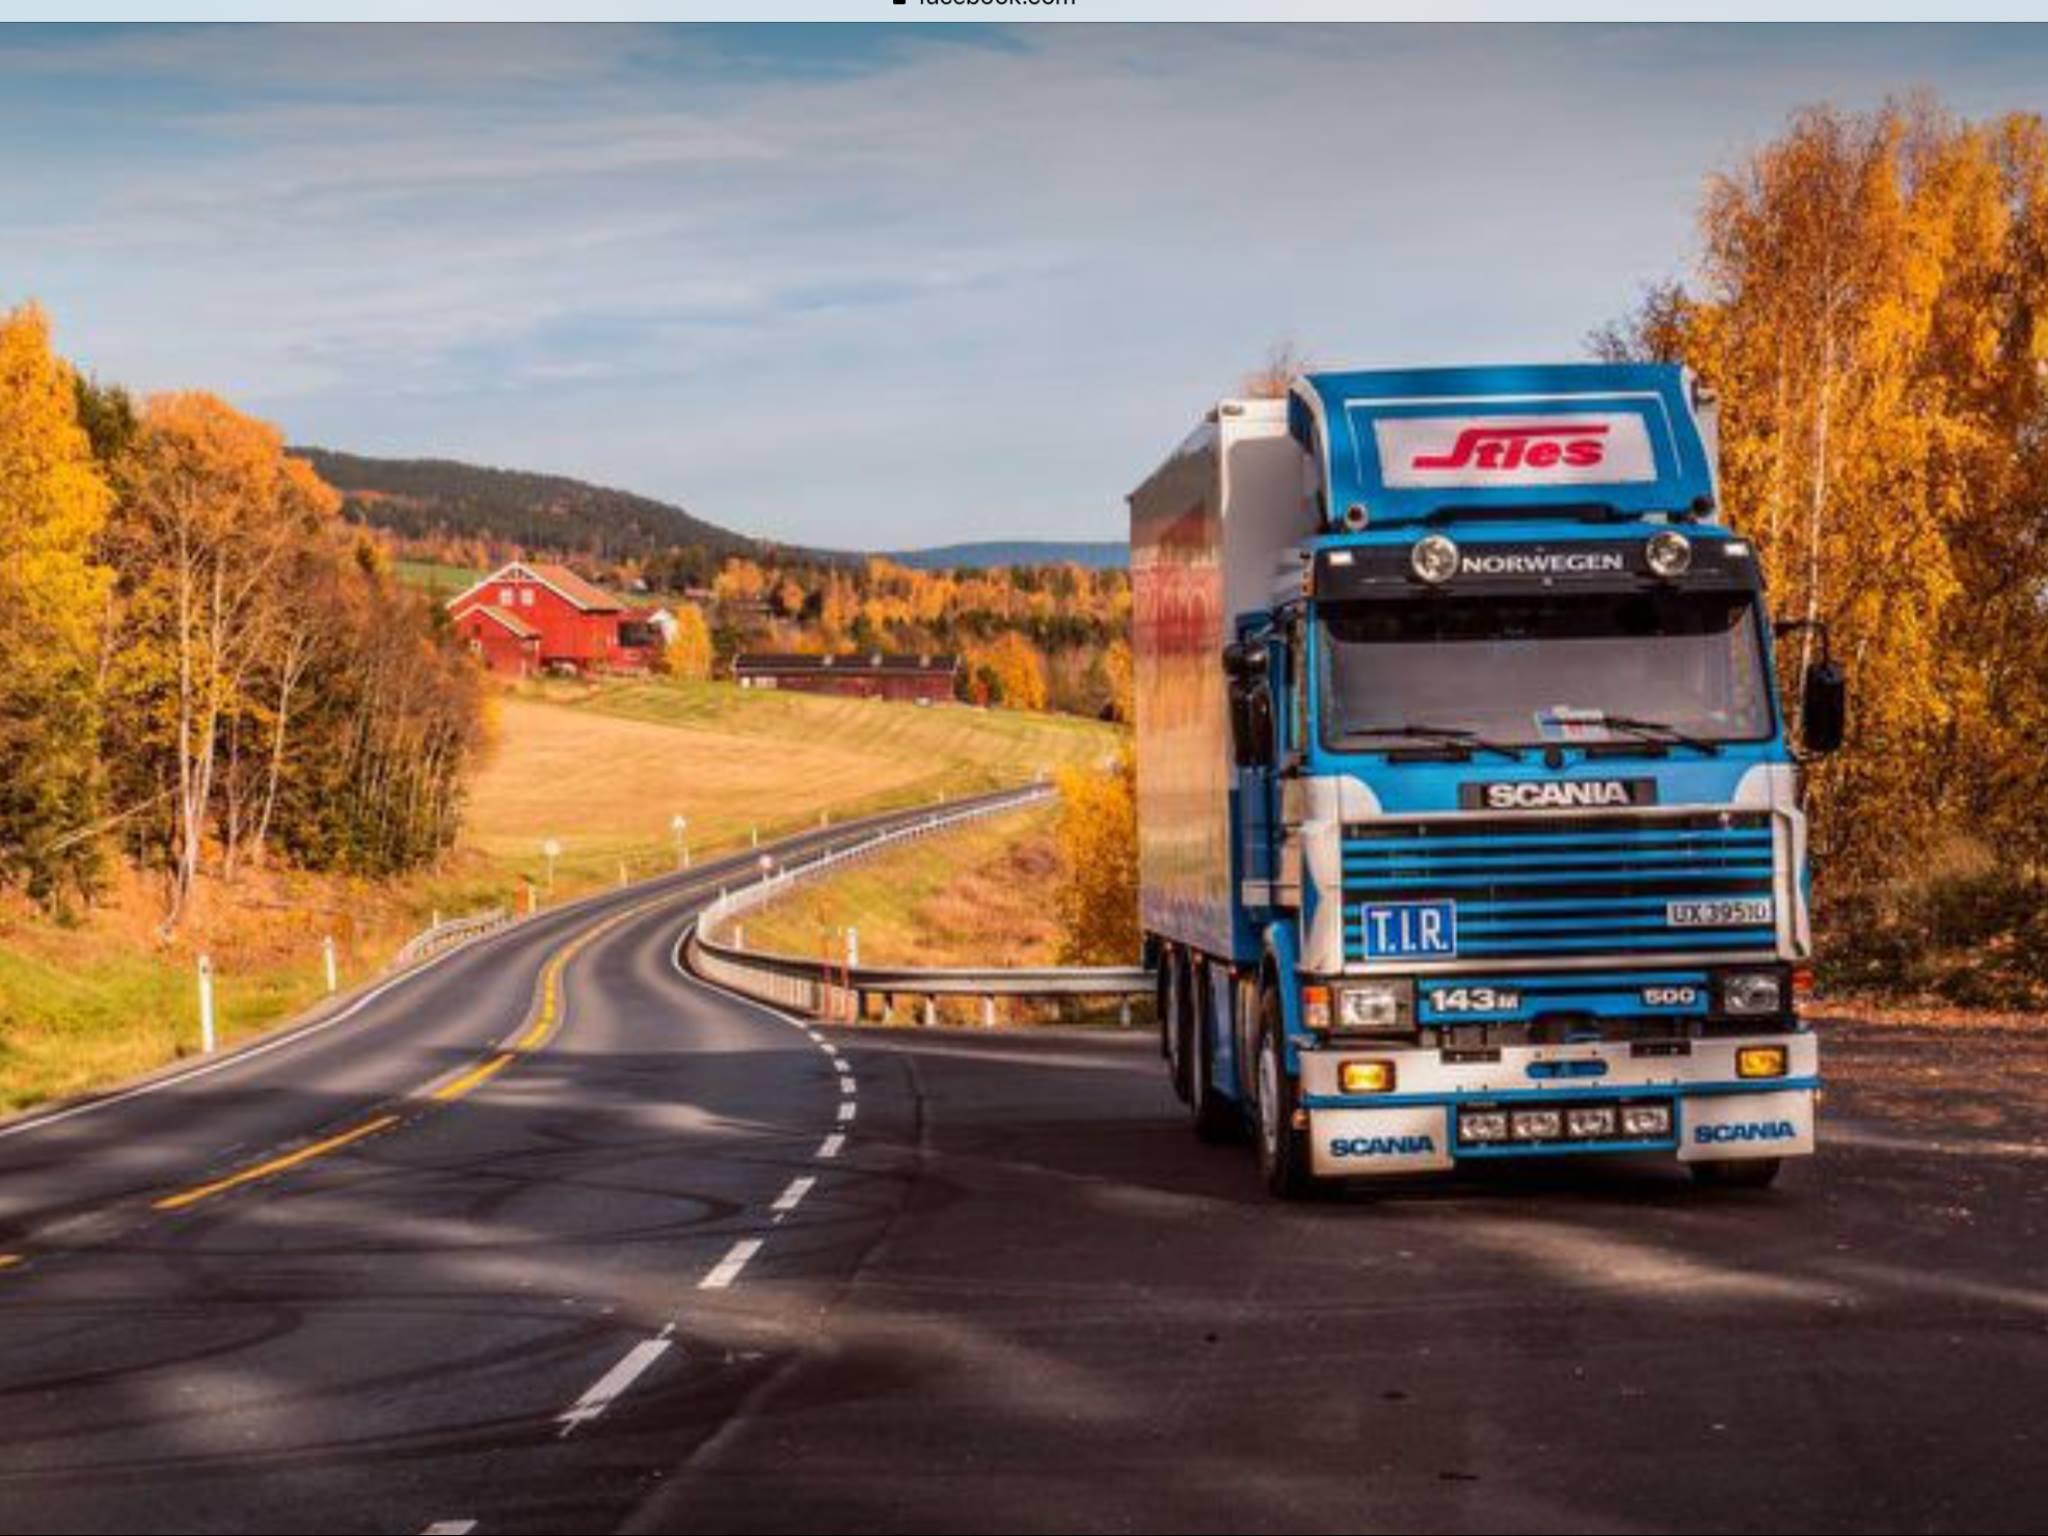 Scania-143-M-500--3